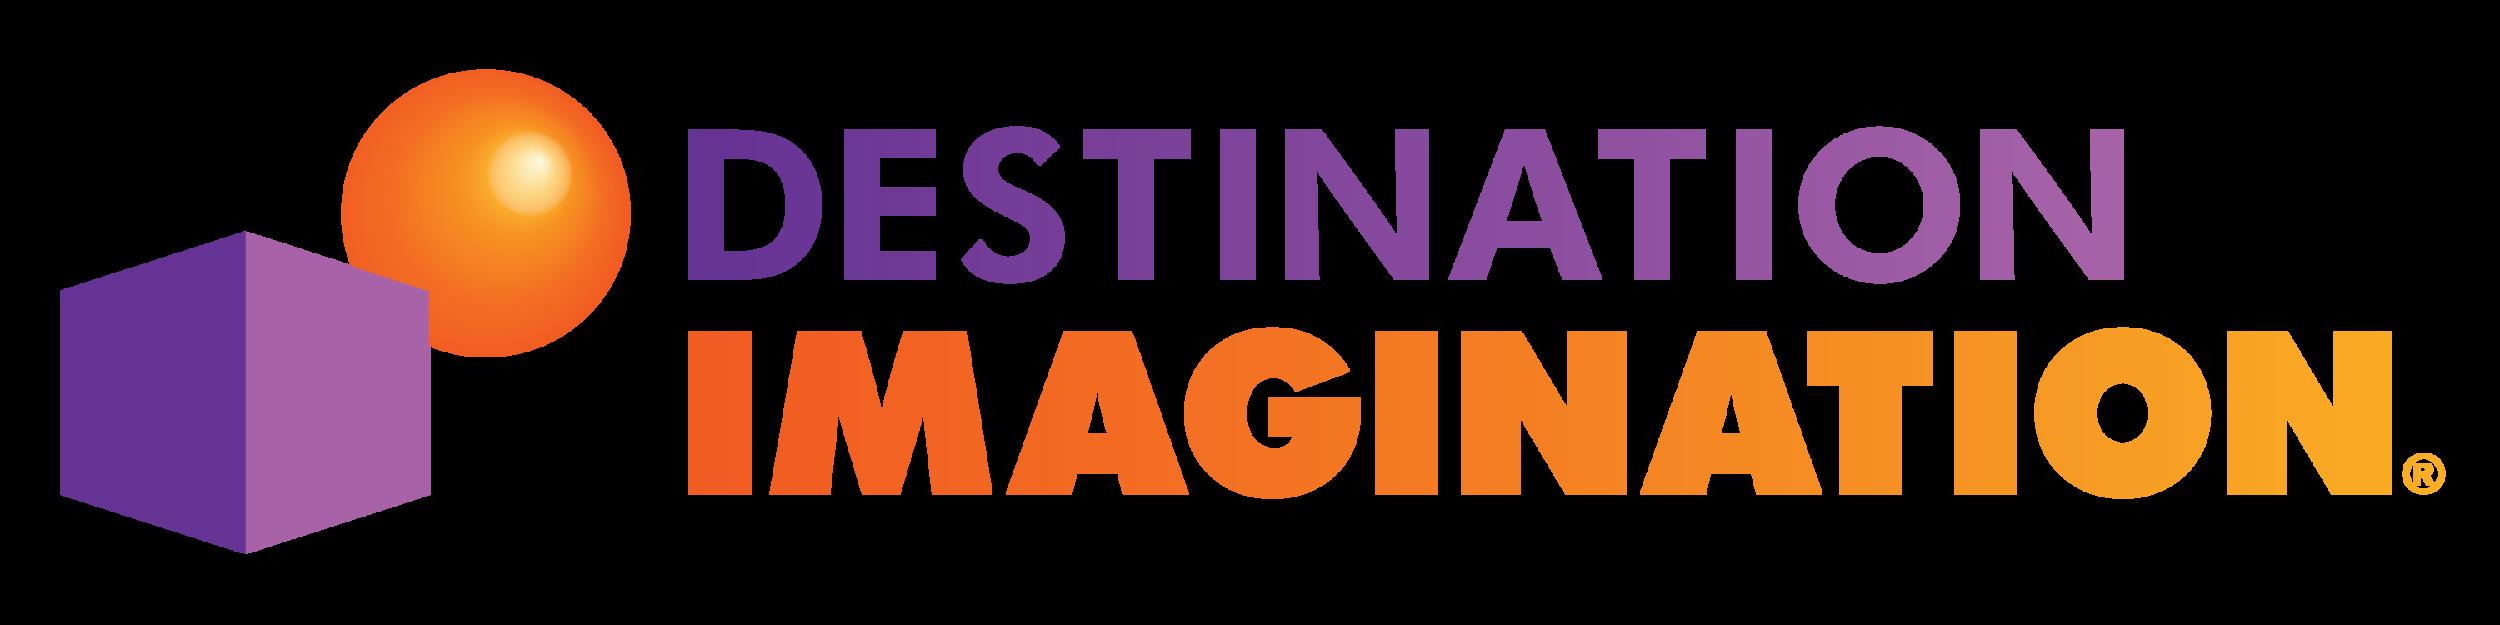 destination-imagination.png